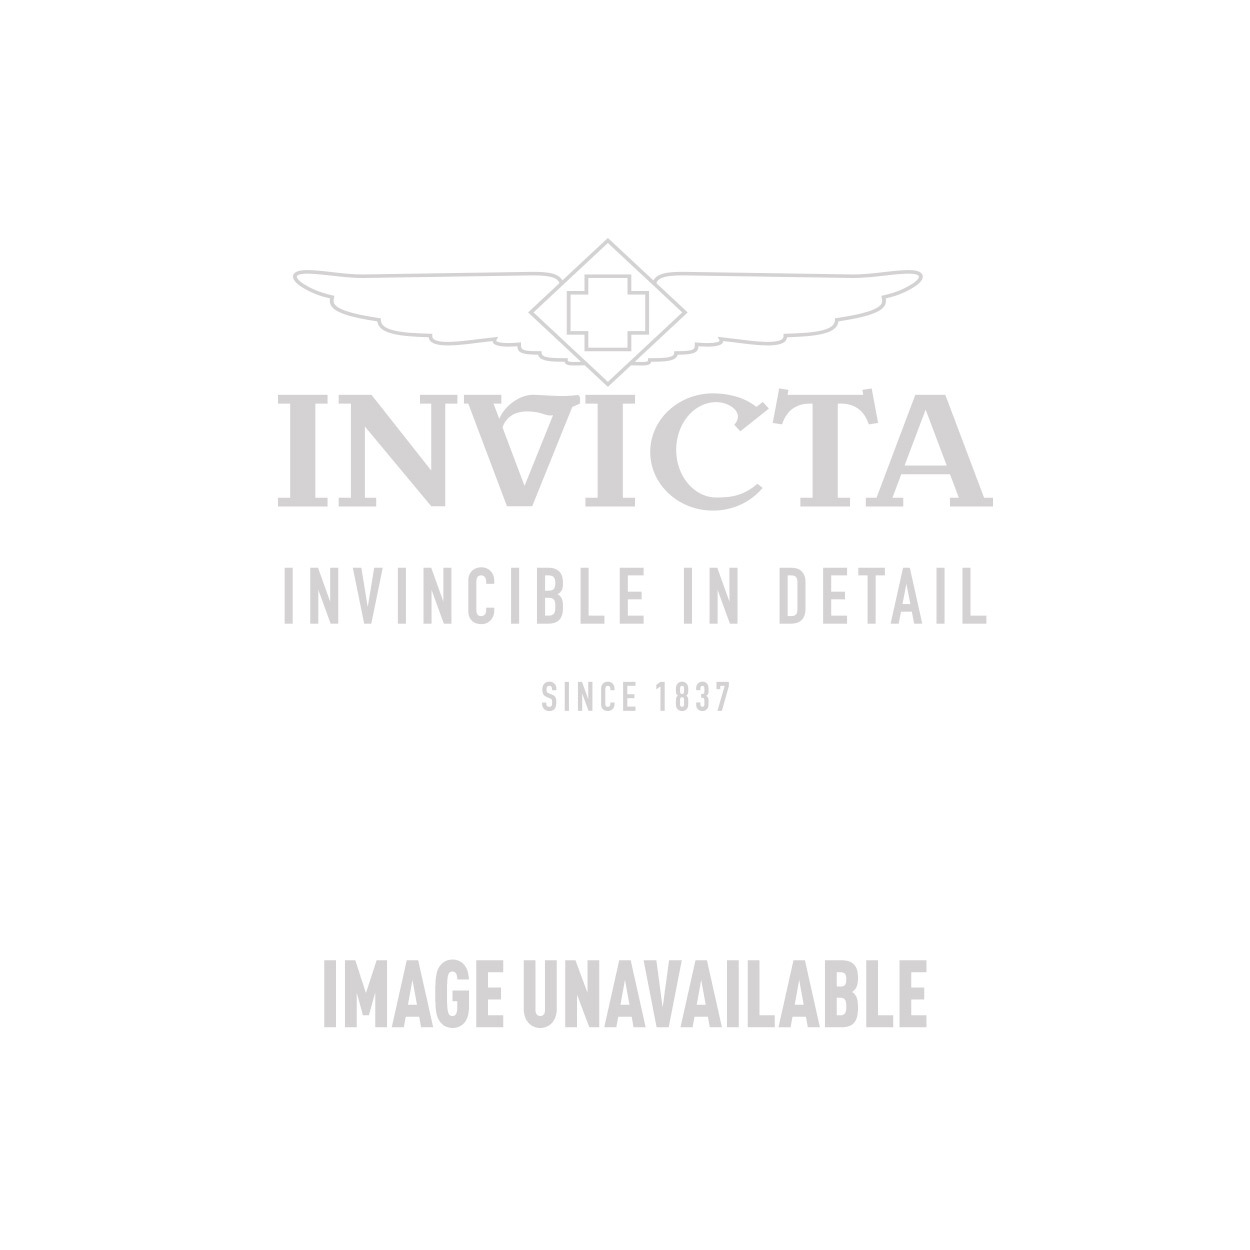 Invicta Lupah Swiss Made Quartz Watch - Gunmetal case with Black tone Leather band - Model 13006